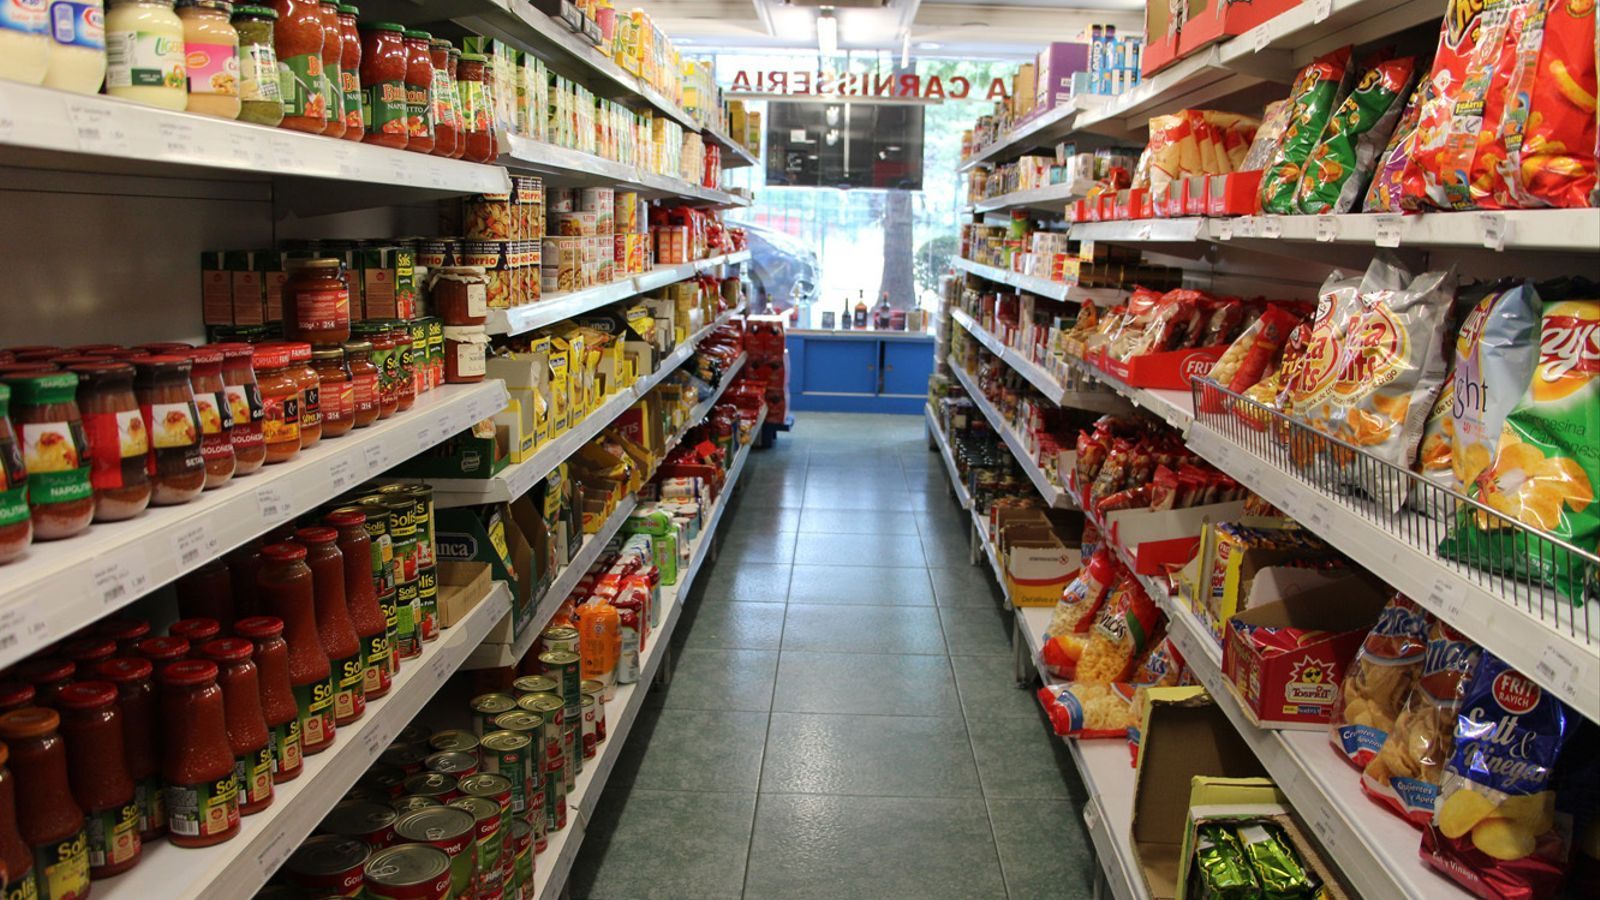 Un passadís d'un supermercat. / ARXIU ANA